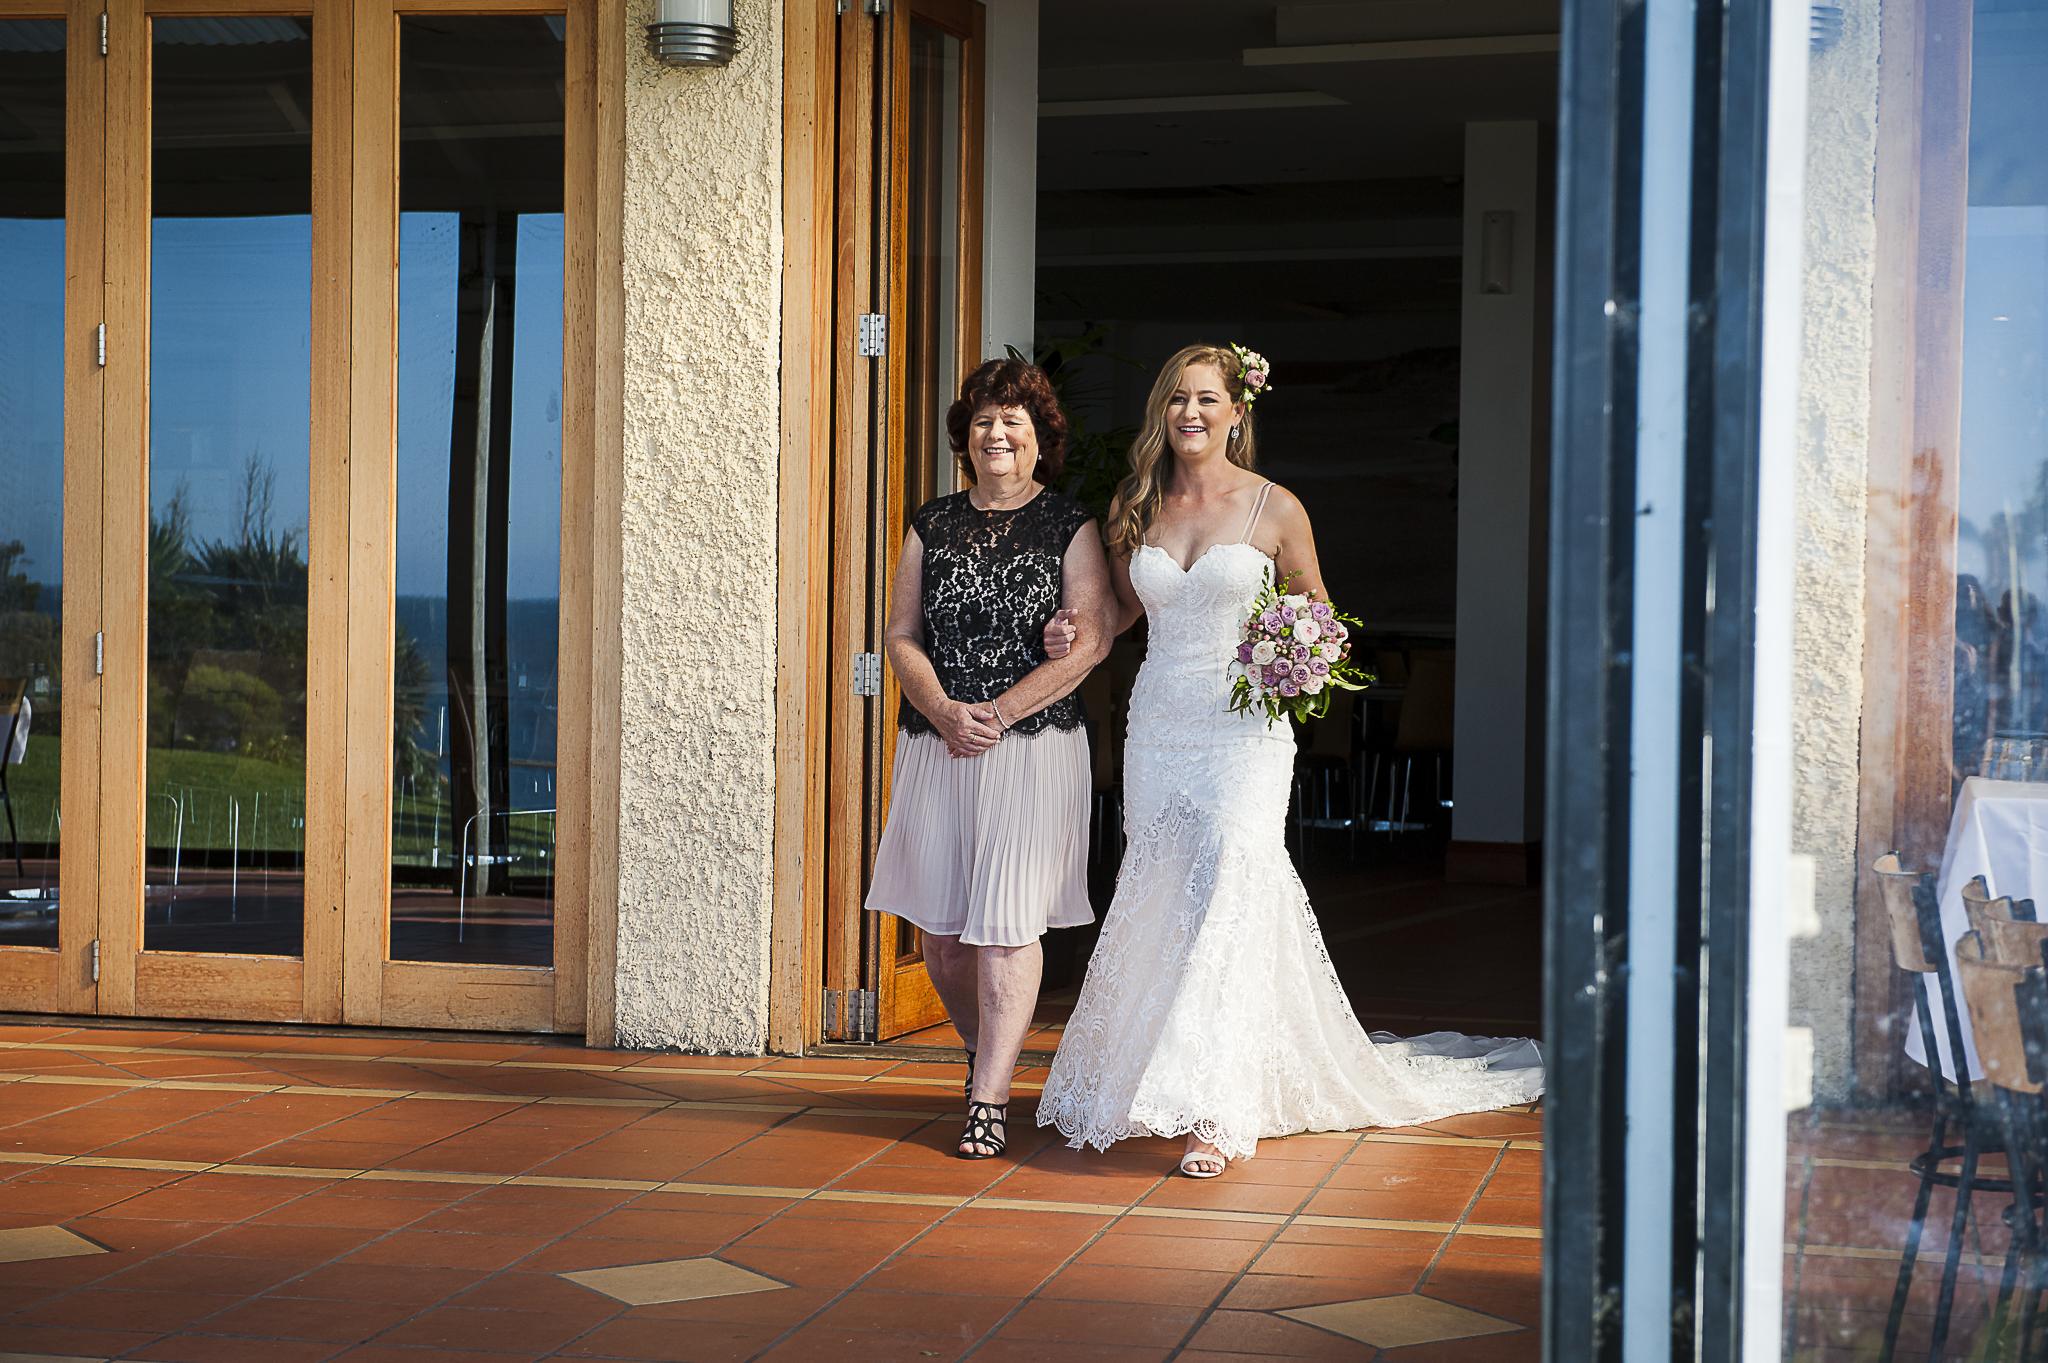 bringlebit farm, wedding flowers, vintage bride, Daylesford wedding, country wedding, vintage wedding